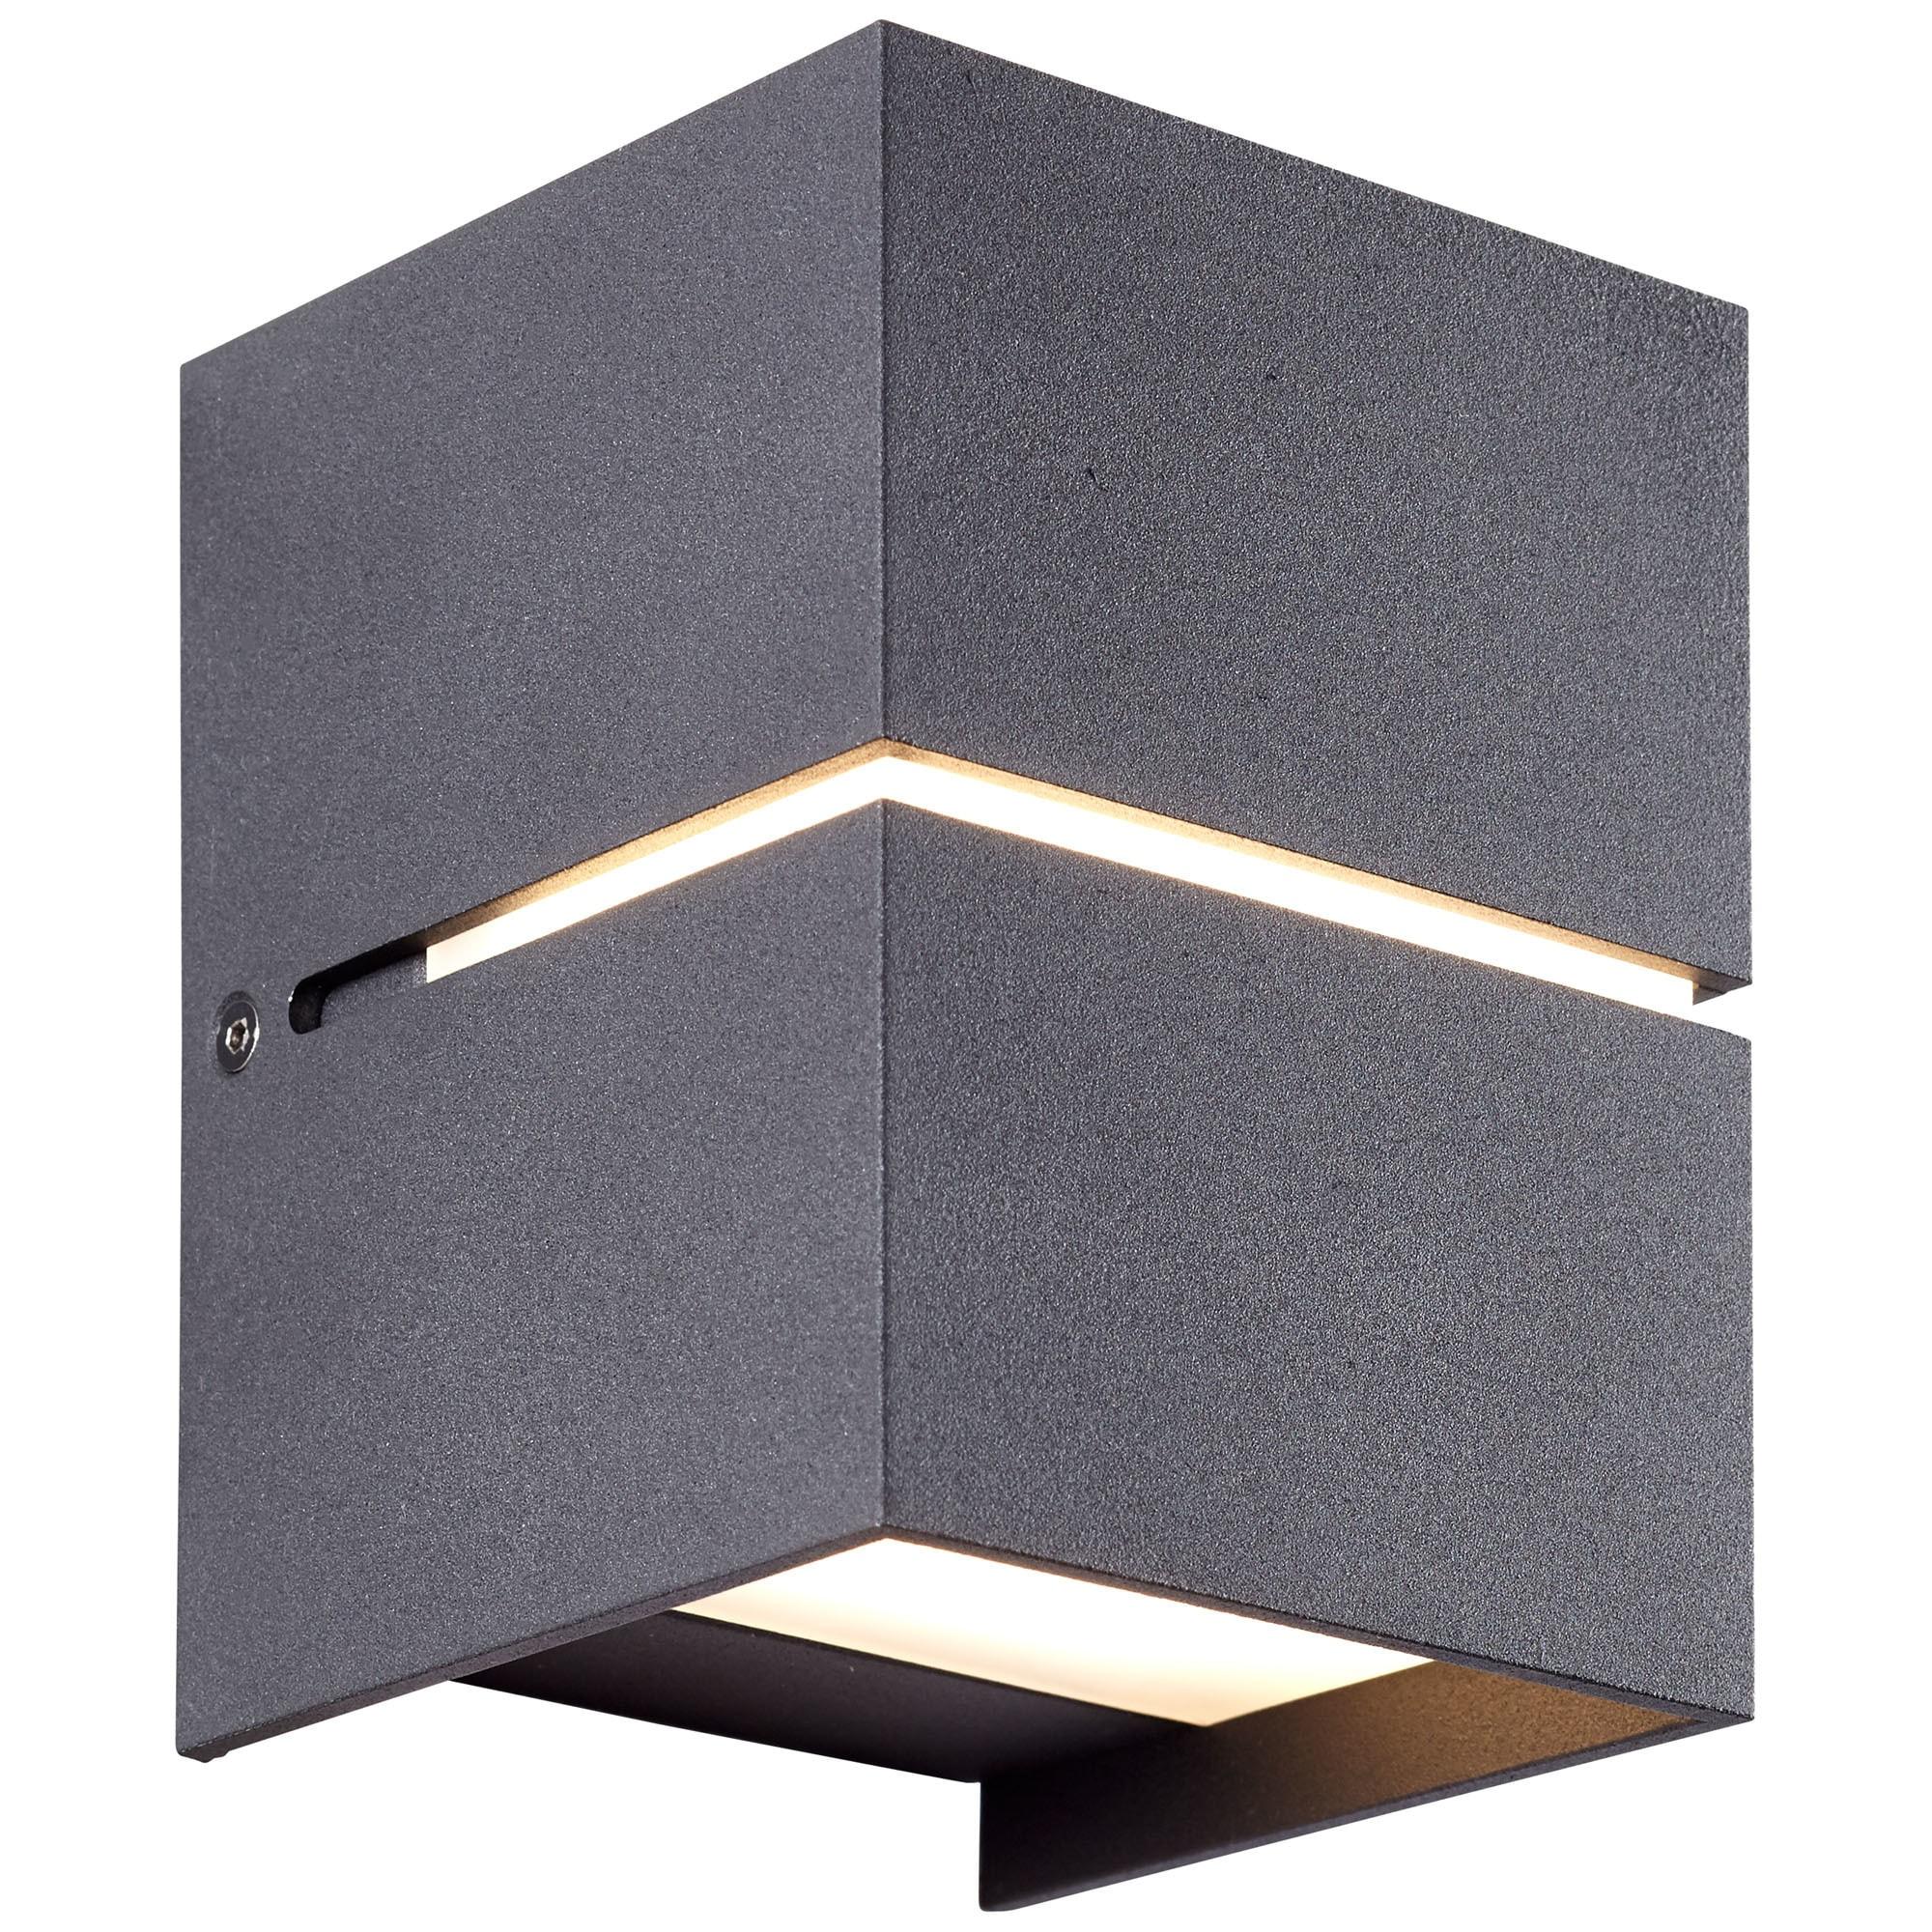 AEG Ania LED Wandleuchte schwarz